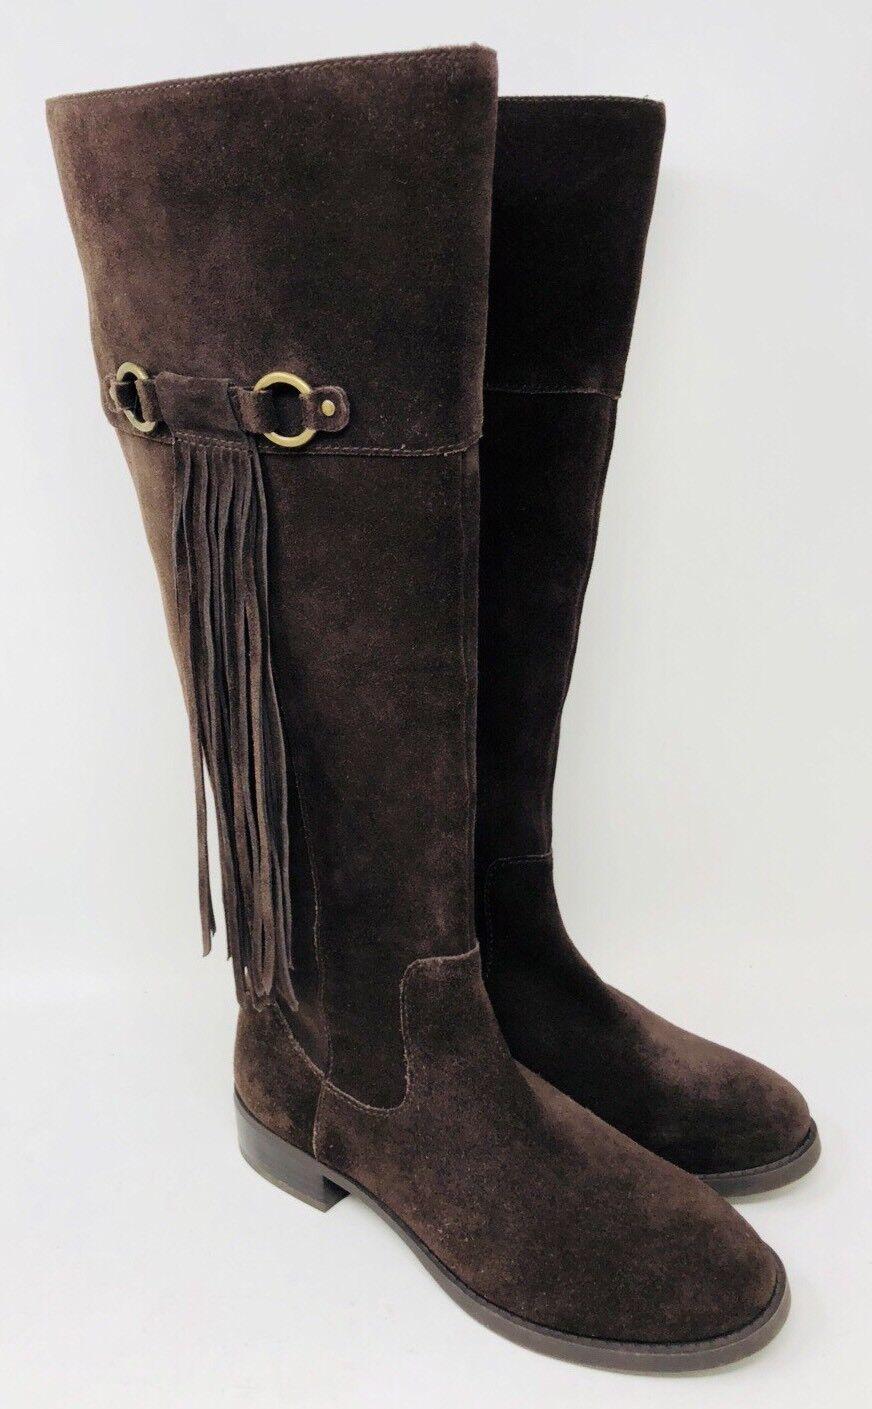 INC International Braun Concepts Fayerbrn Tall Stiefel Wide Calf Braun International Suede Größe 5.5 394e9b